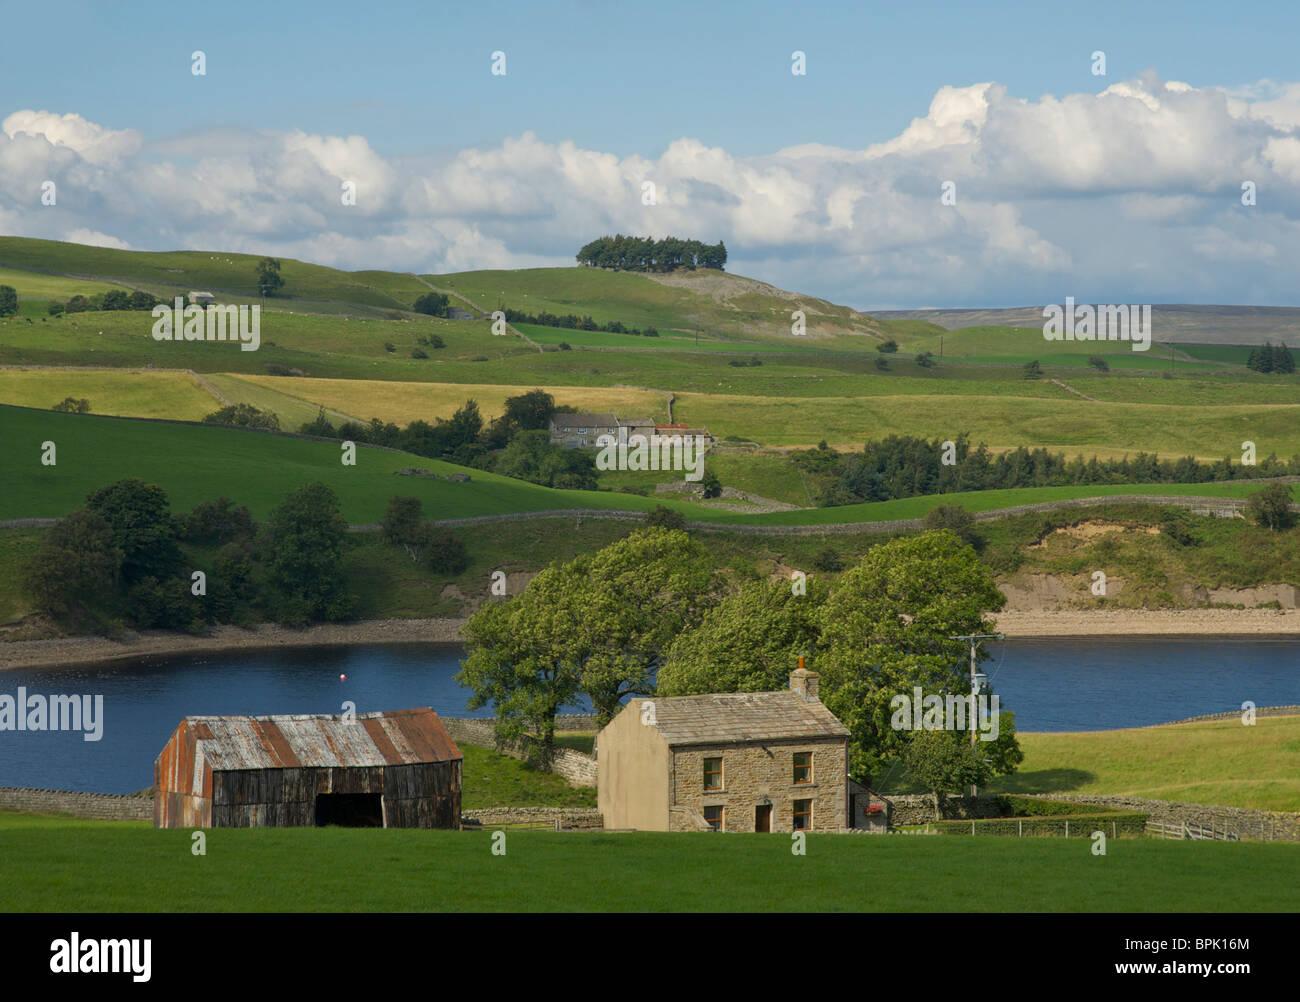 Grassholme Reservoir, Lunedale, near Middleton-in-Teesdale, County Durham, England, UK - Stock Image